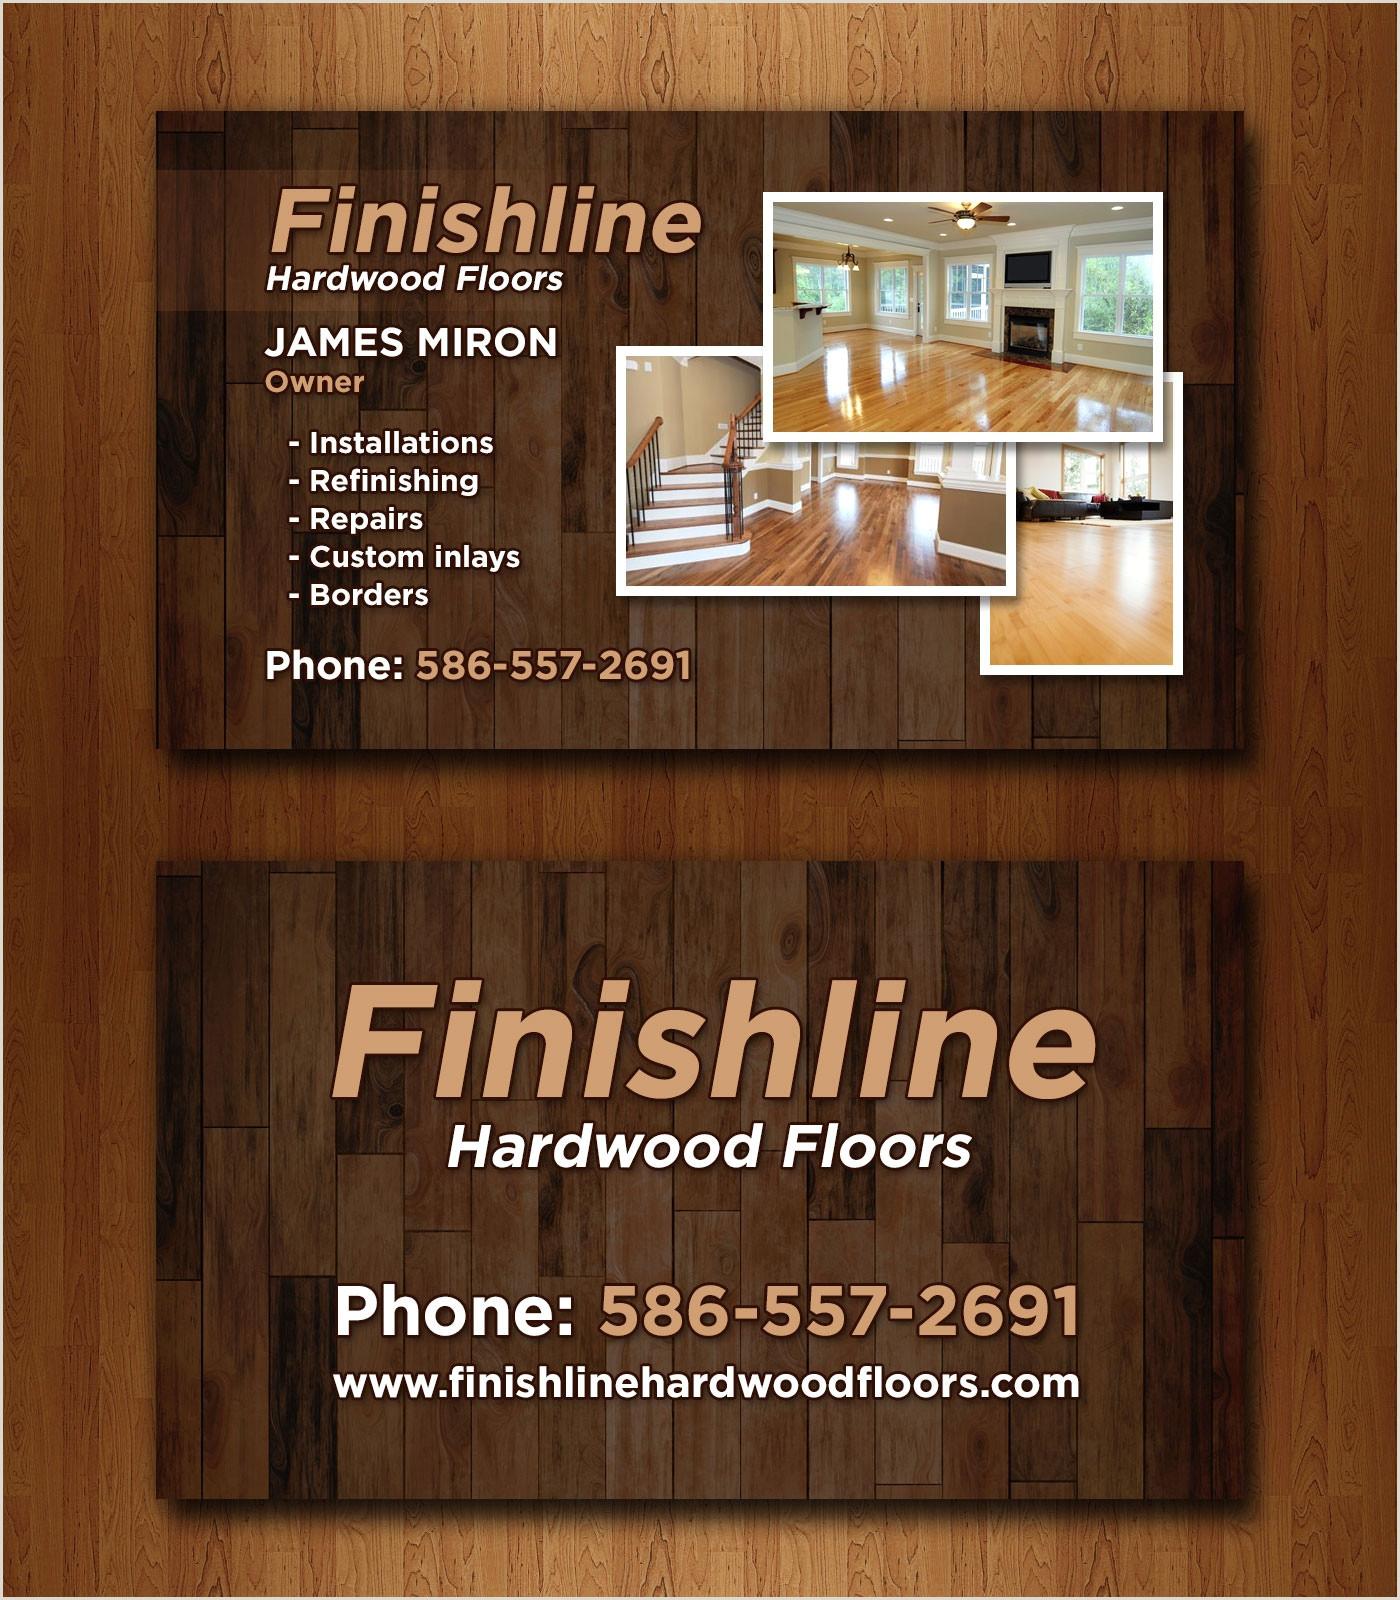 Design And Print Business Cards 14 Popular Hardwood Flooring Business Card Template